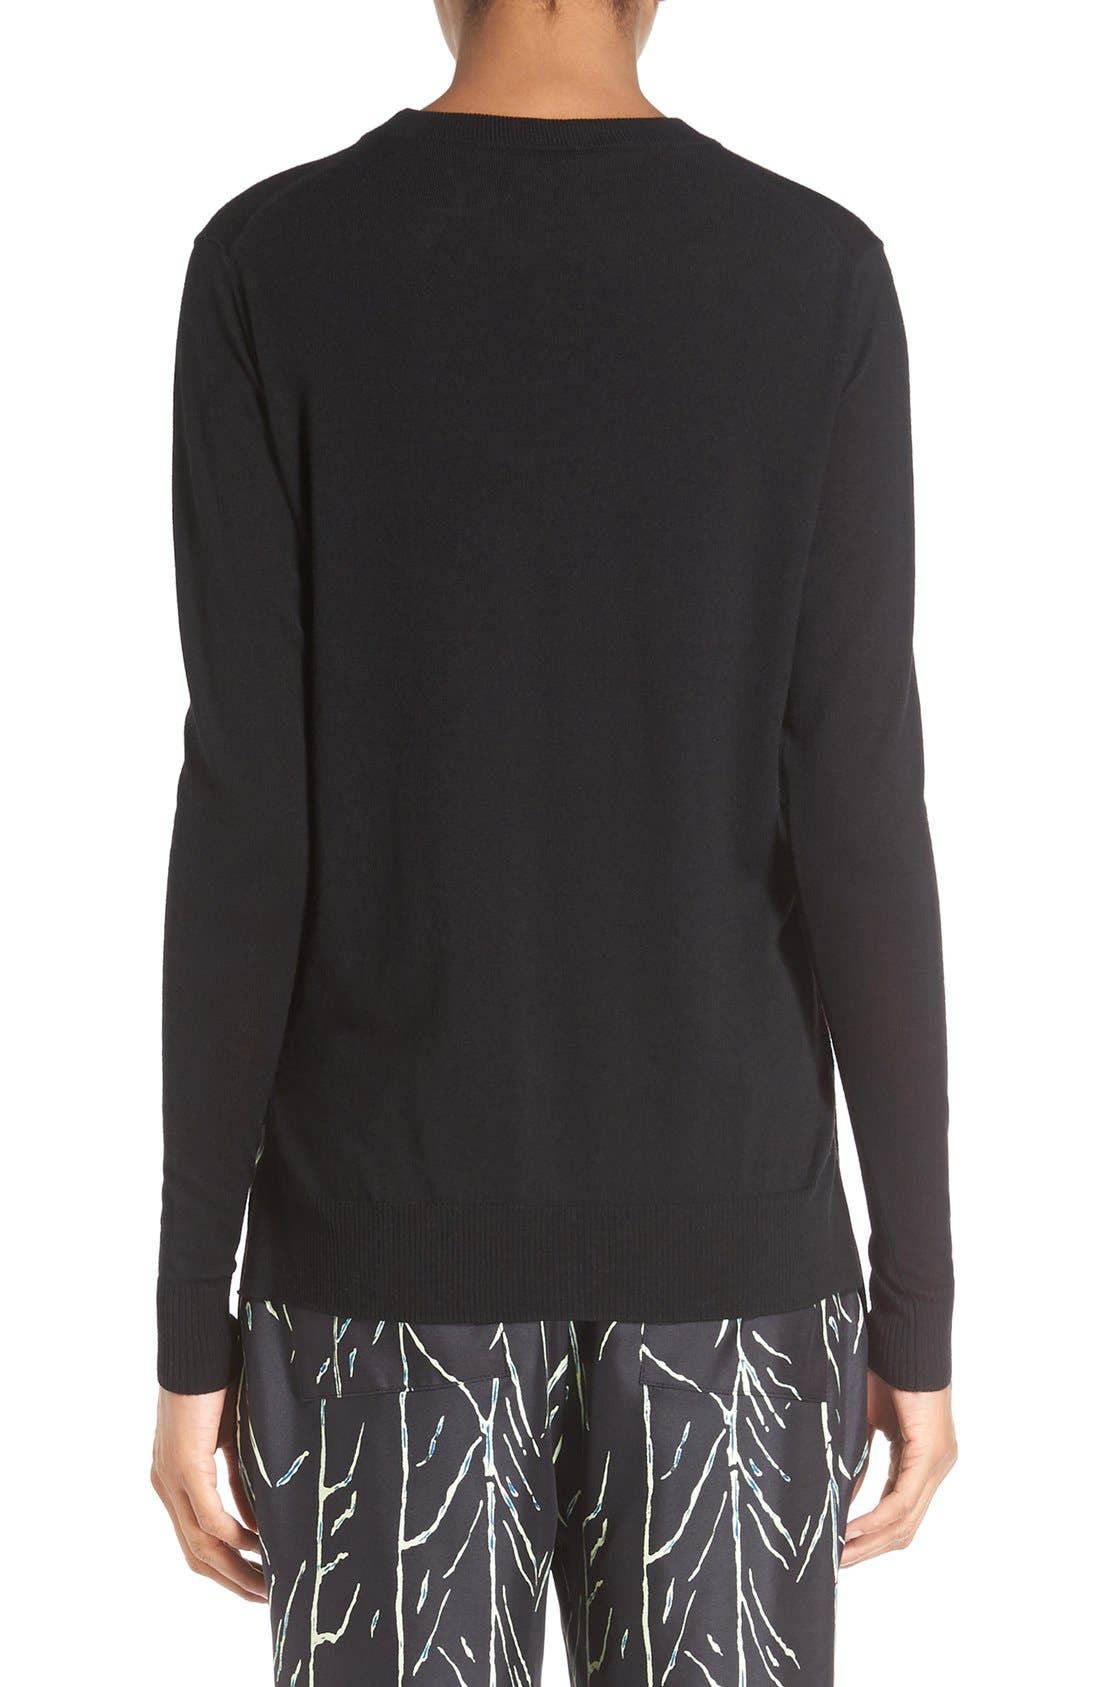 Superfine Merino Wool Sweater,                             Alternate thumbnail 2, color,                             Black